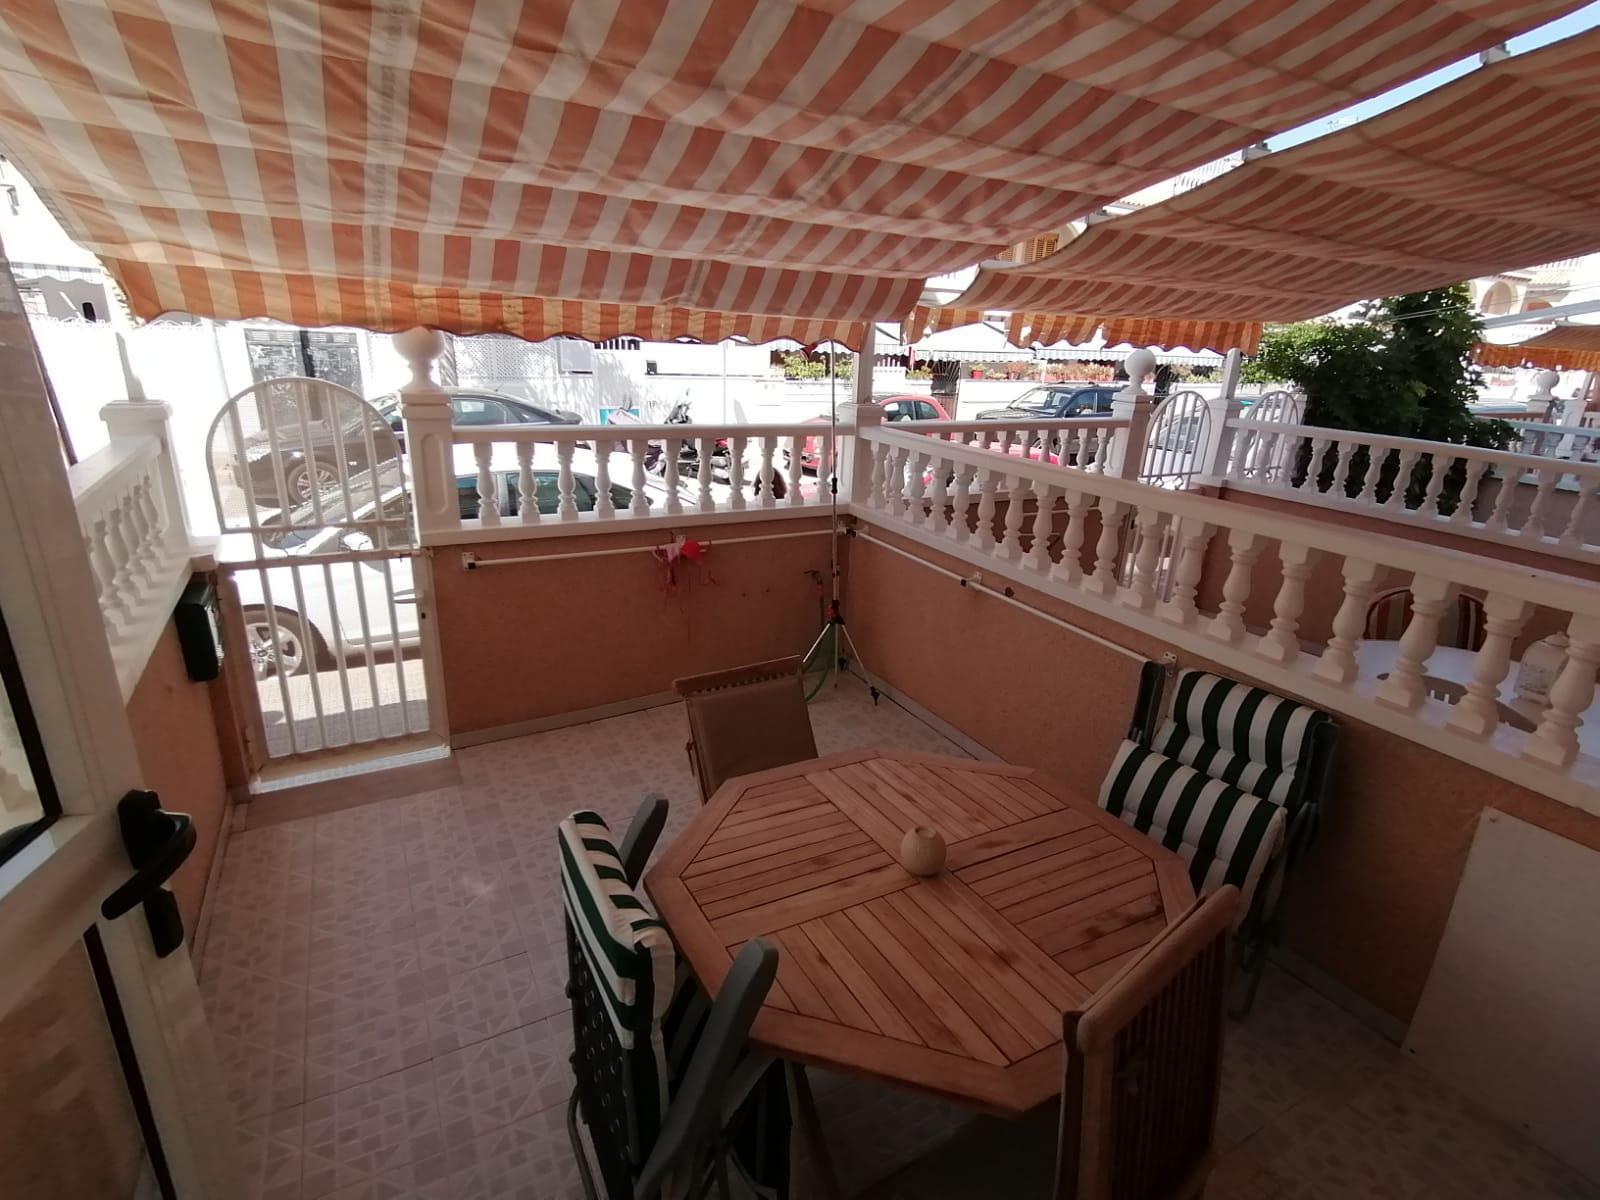 Imagen 1 Casa Adosada en venta en Santa Pola / Playa lisa-Tamarit